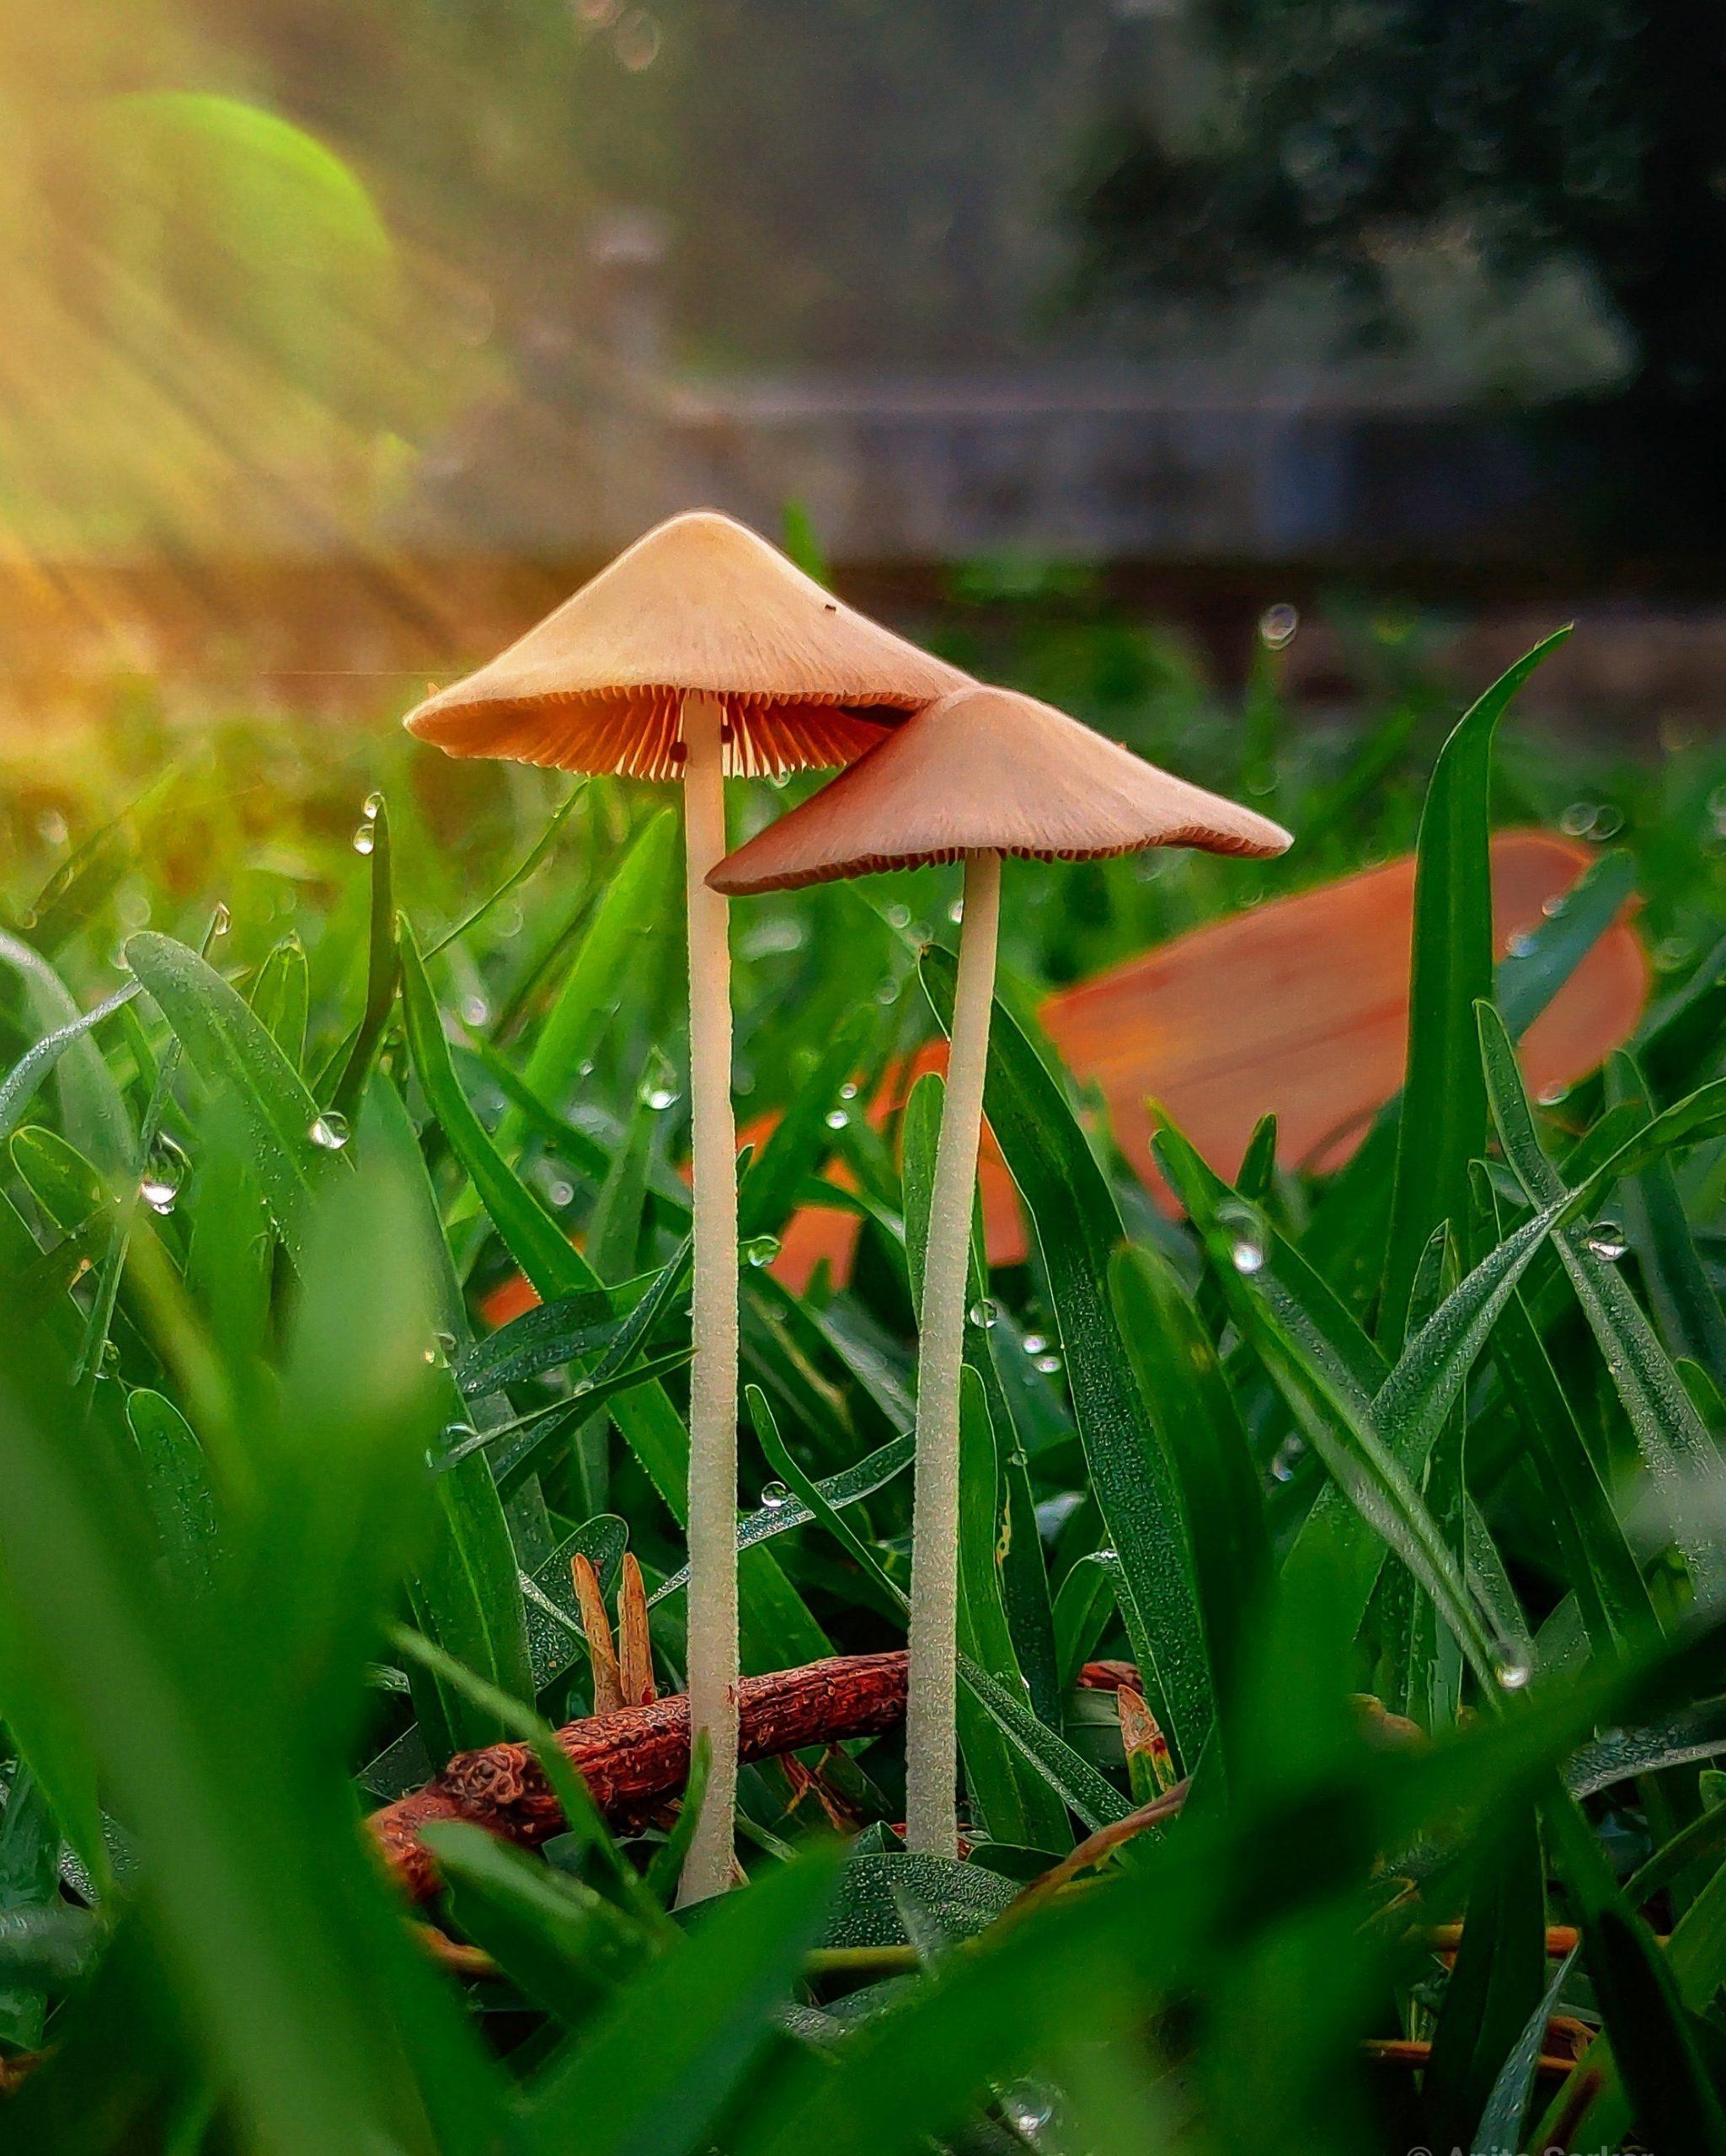 Mushroom blooming in nature